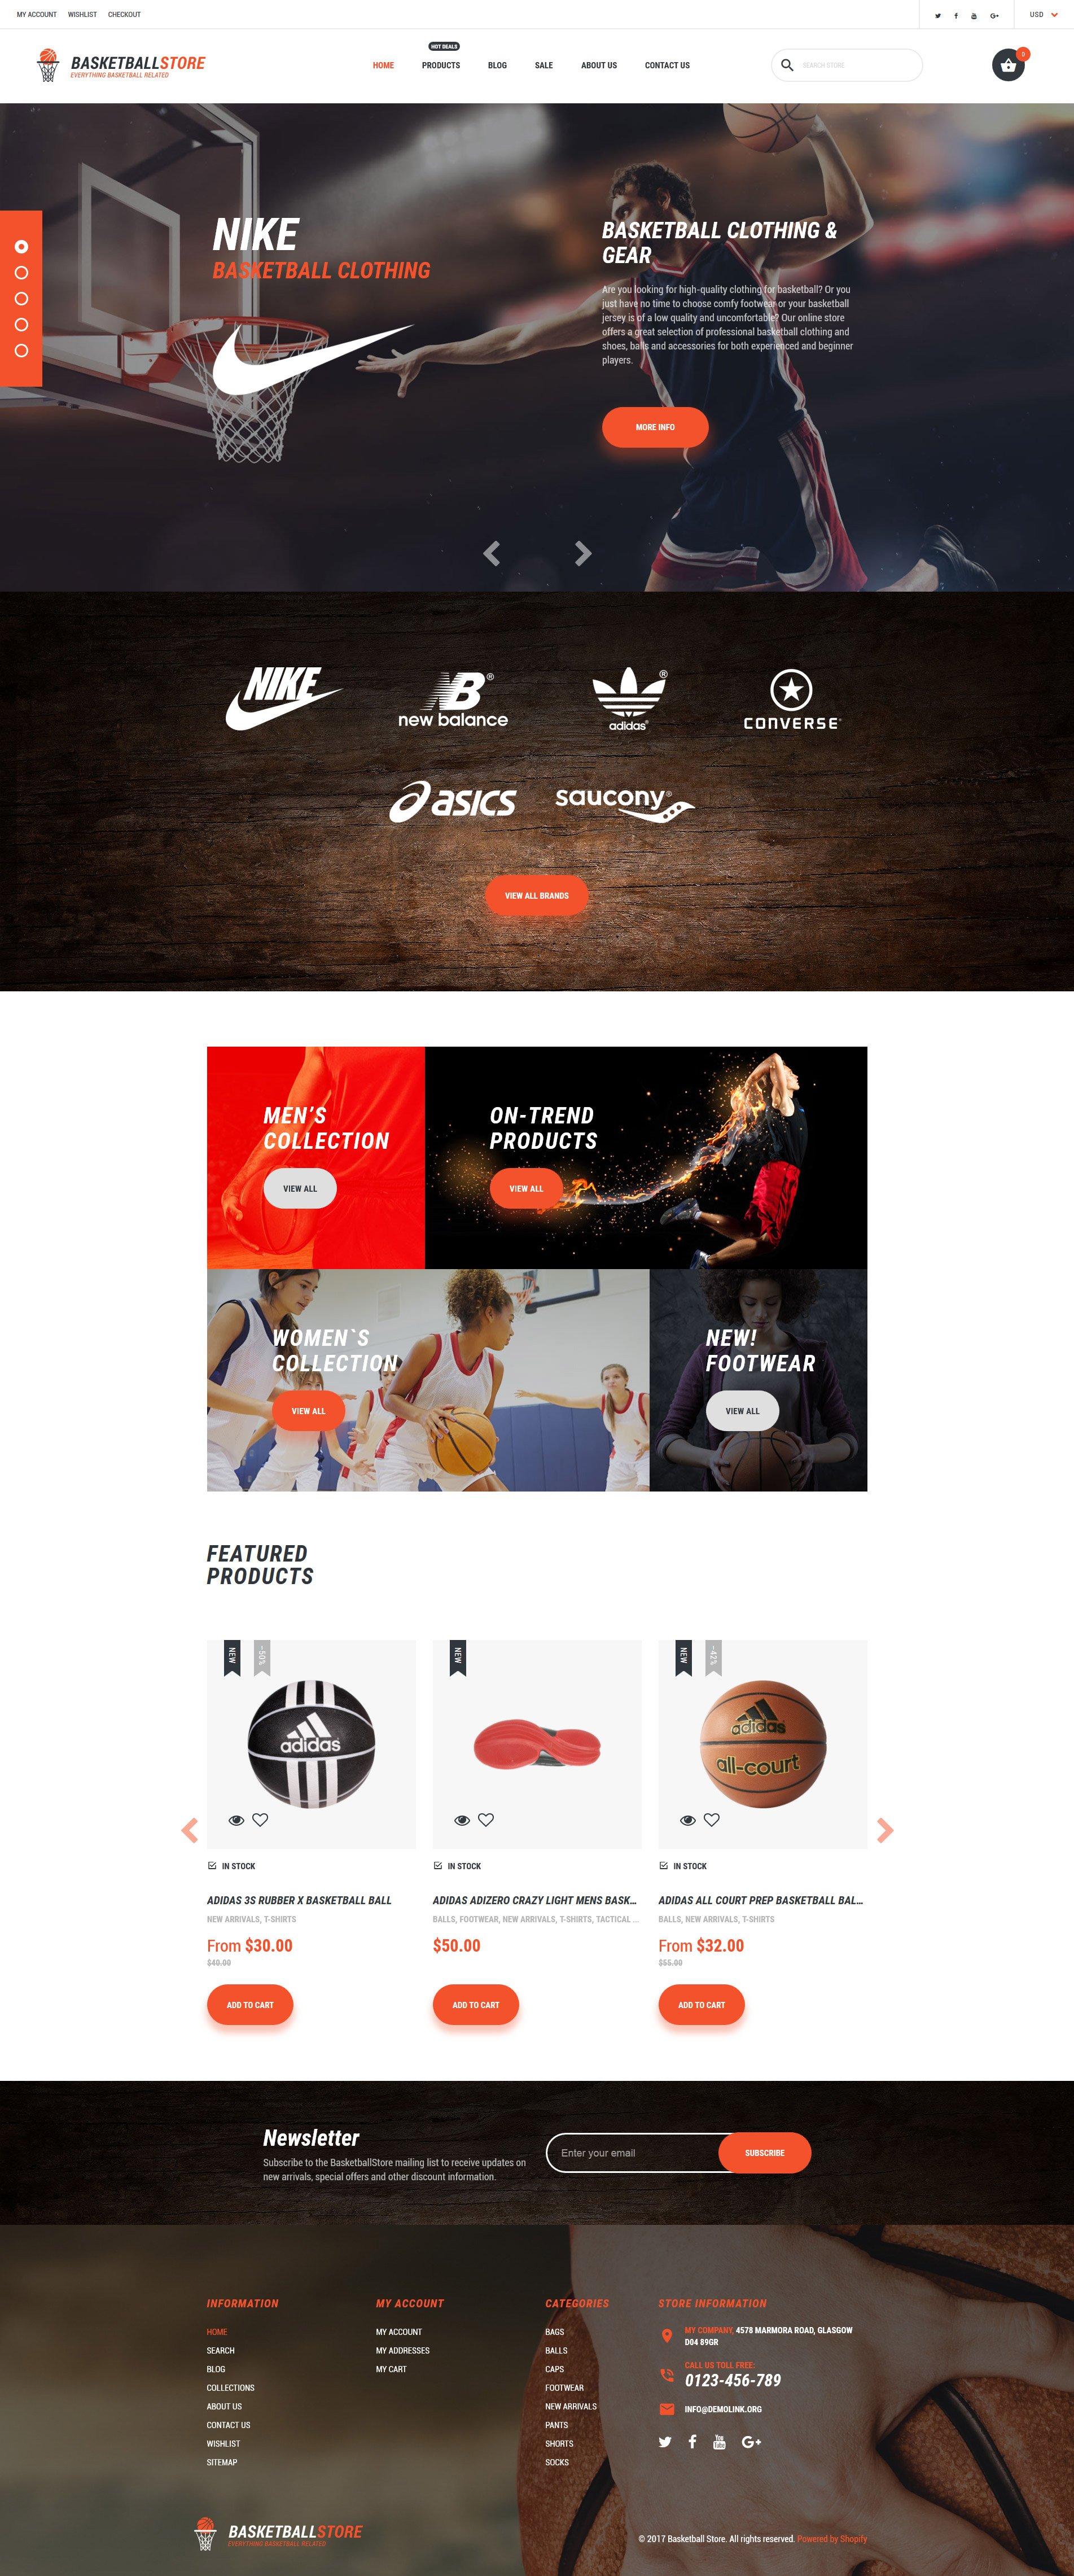 Basketball Responsive Shopify Theme - screenshot